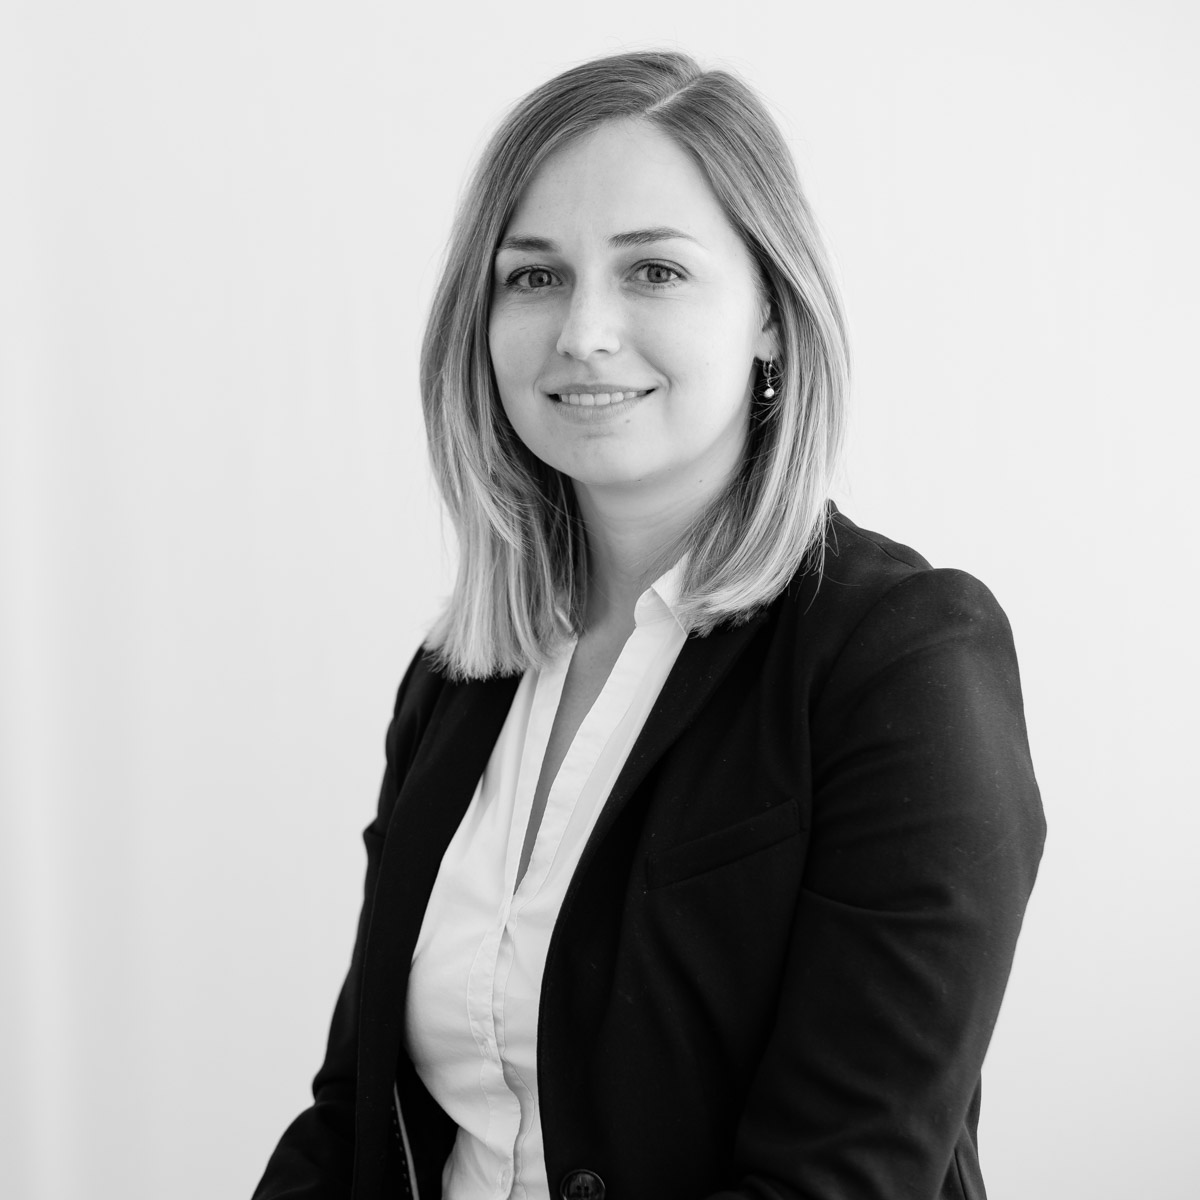 Mag. Laura Schobesberger